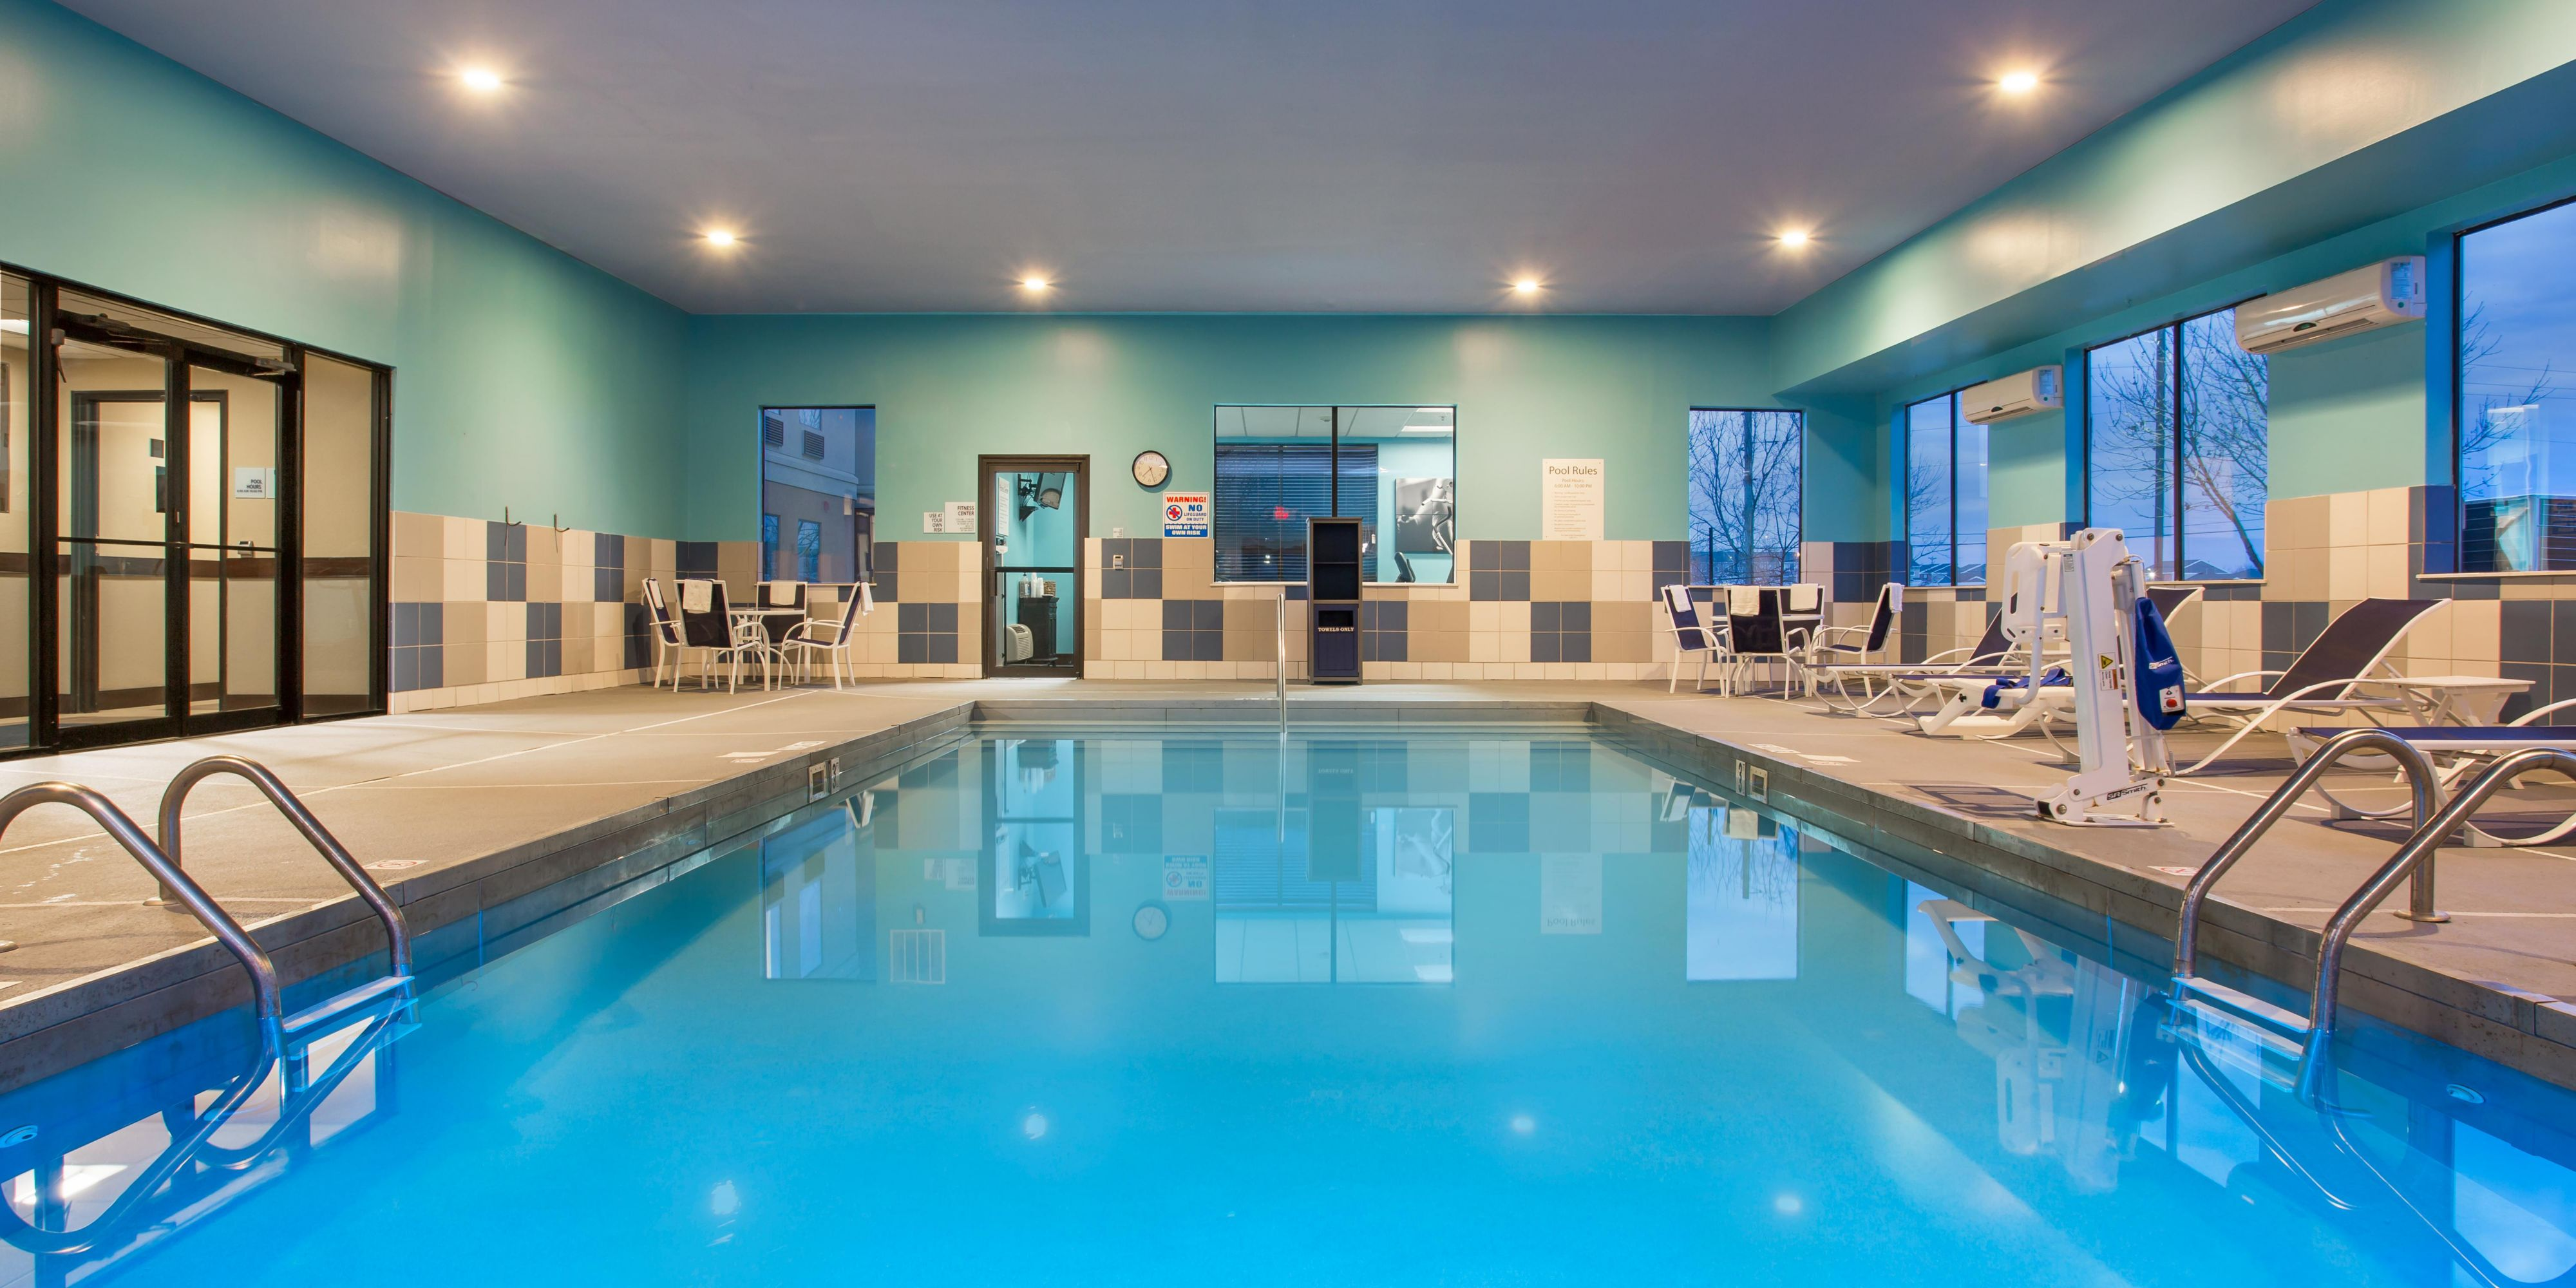 Holiday Inn Express Nicholasville 4030224383 2x1